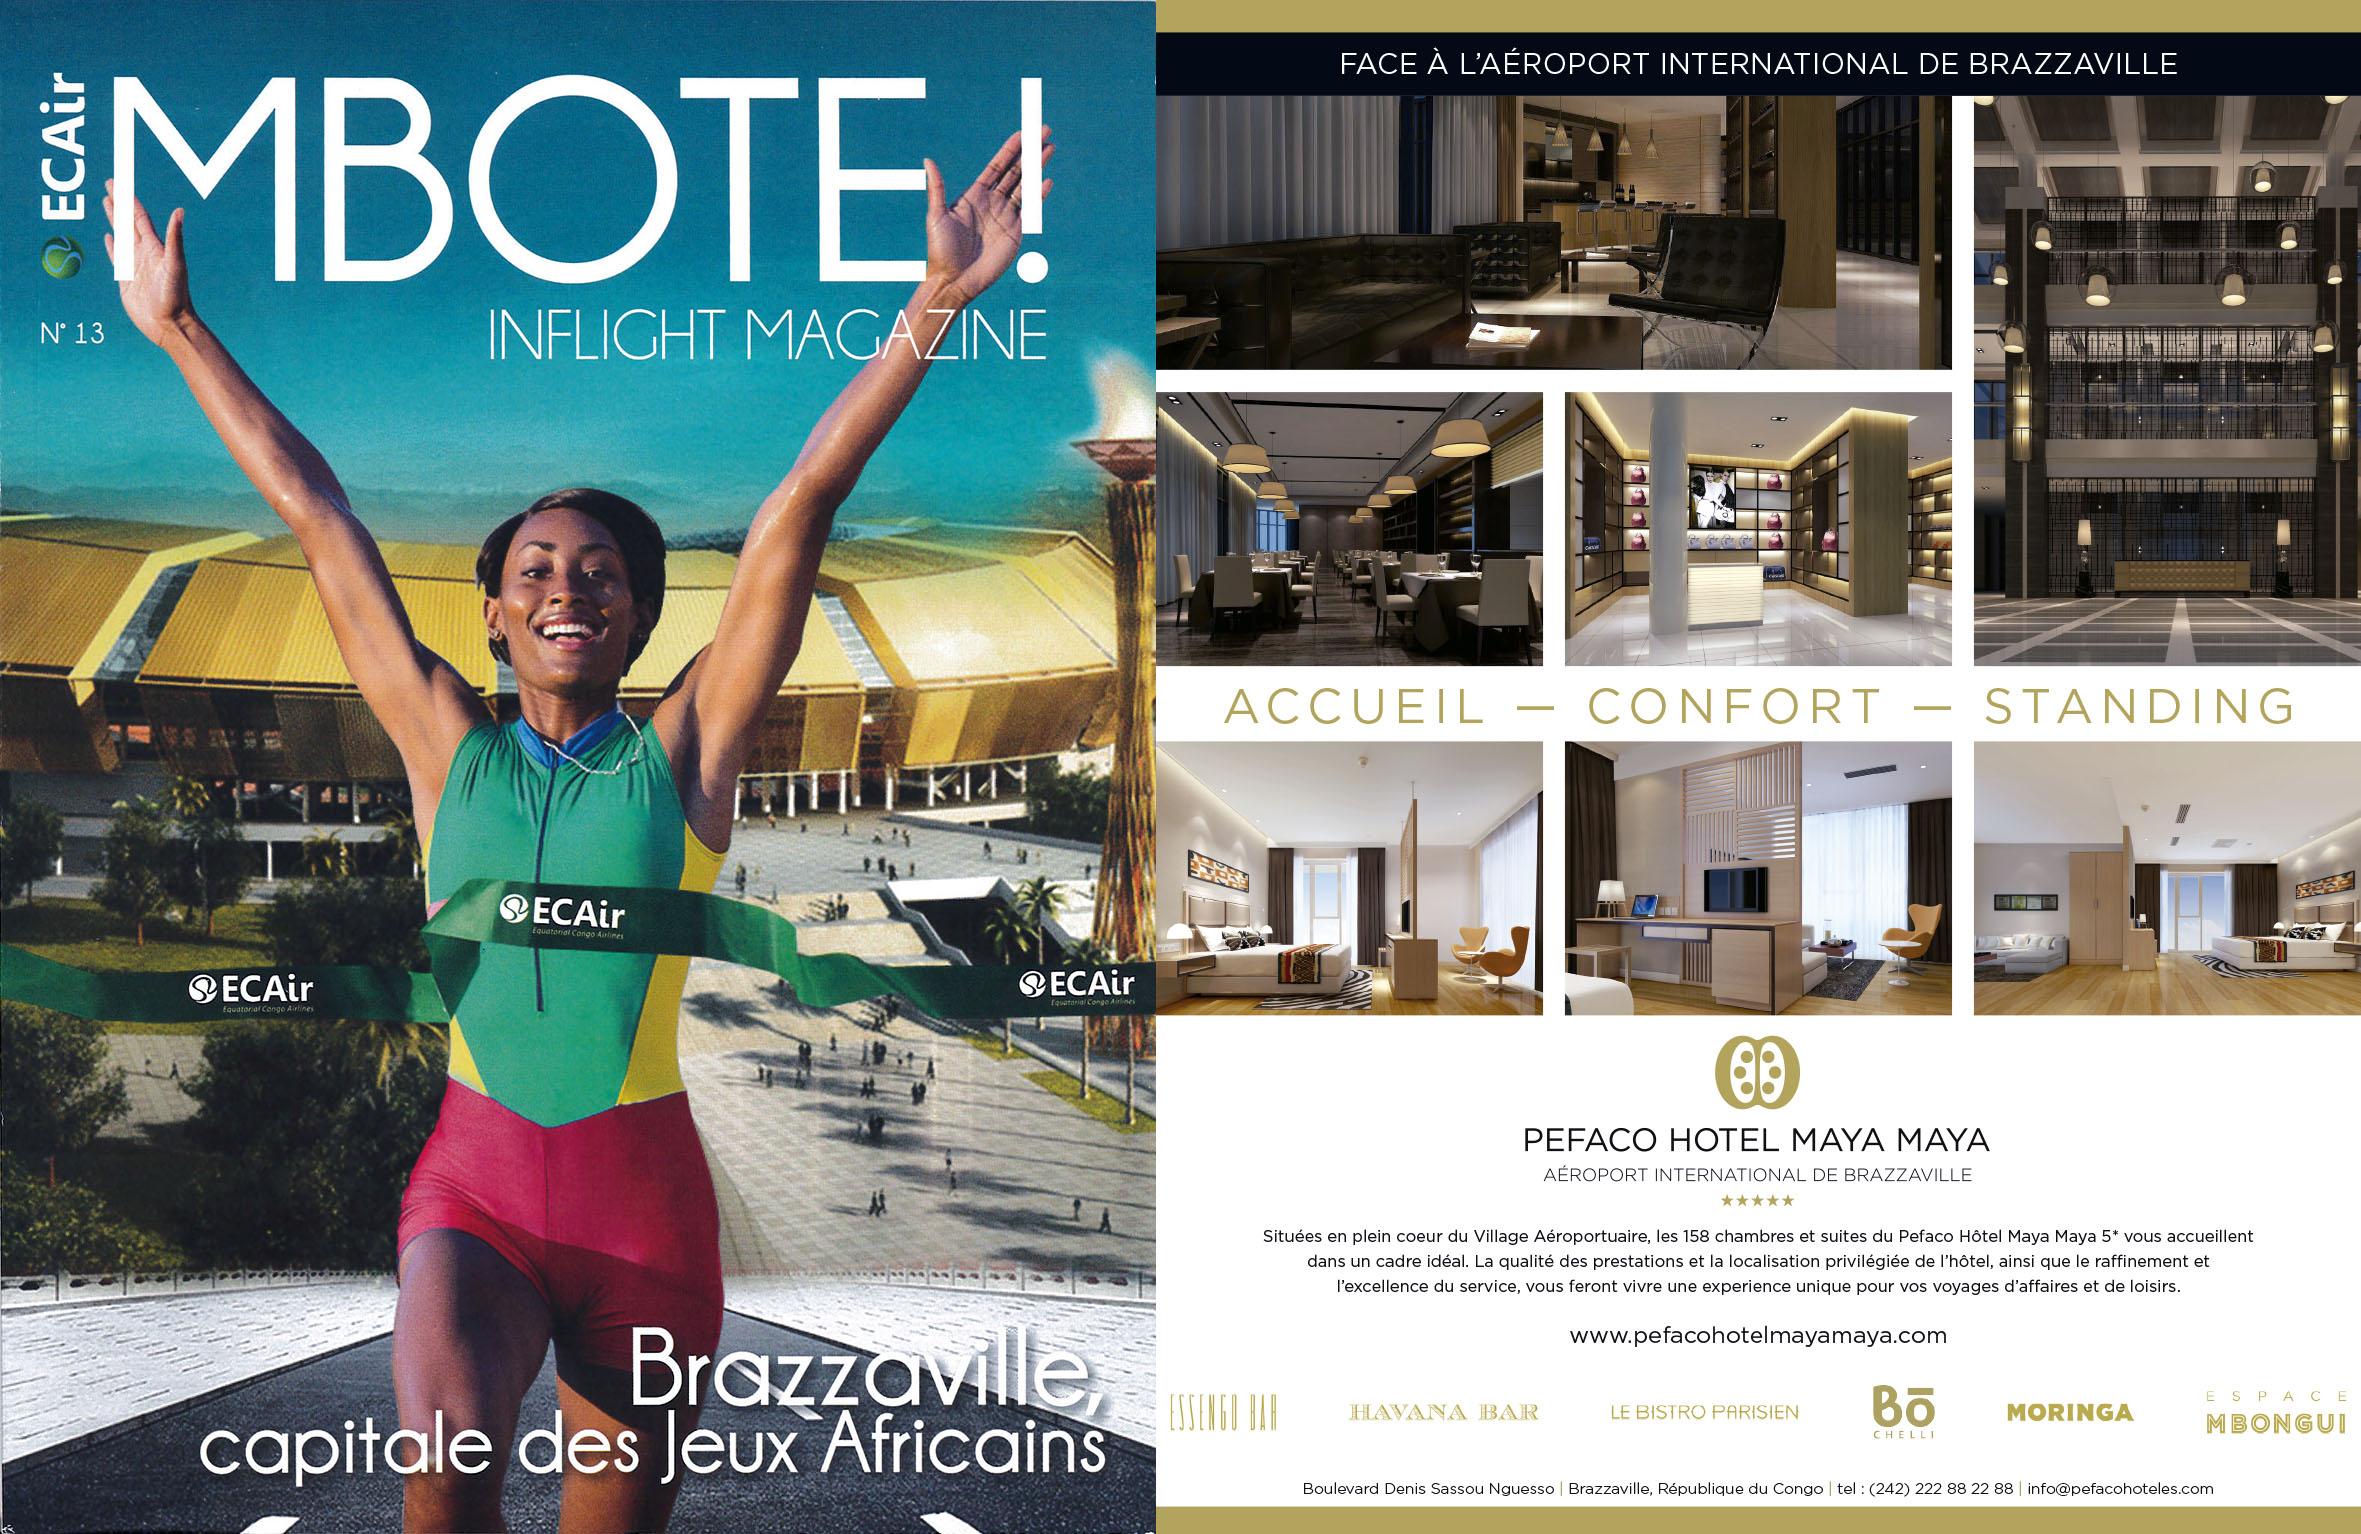 Pefaco Hotel Maya Maya 5* in Mboté!, ECAIR's magazine — PEFACO HOTEL